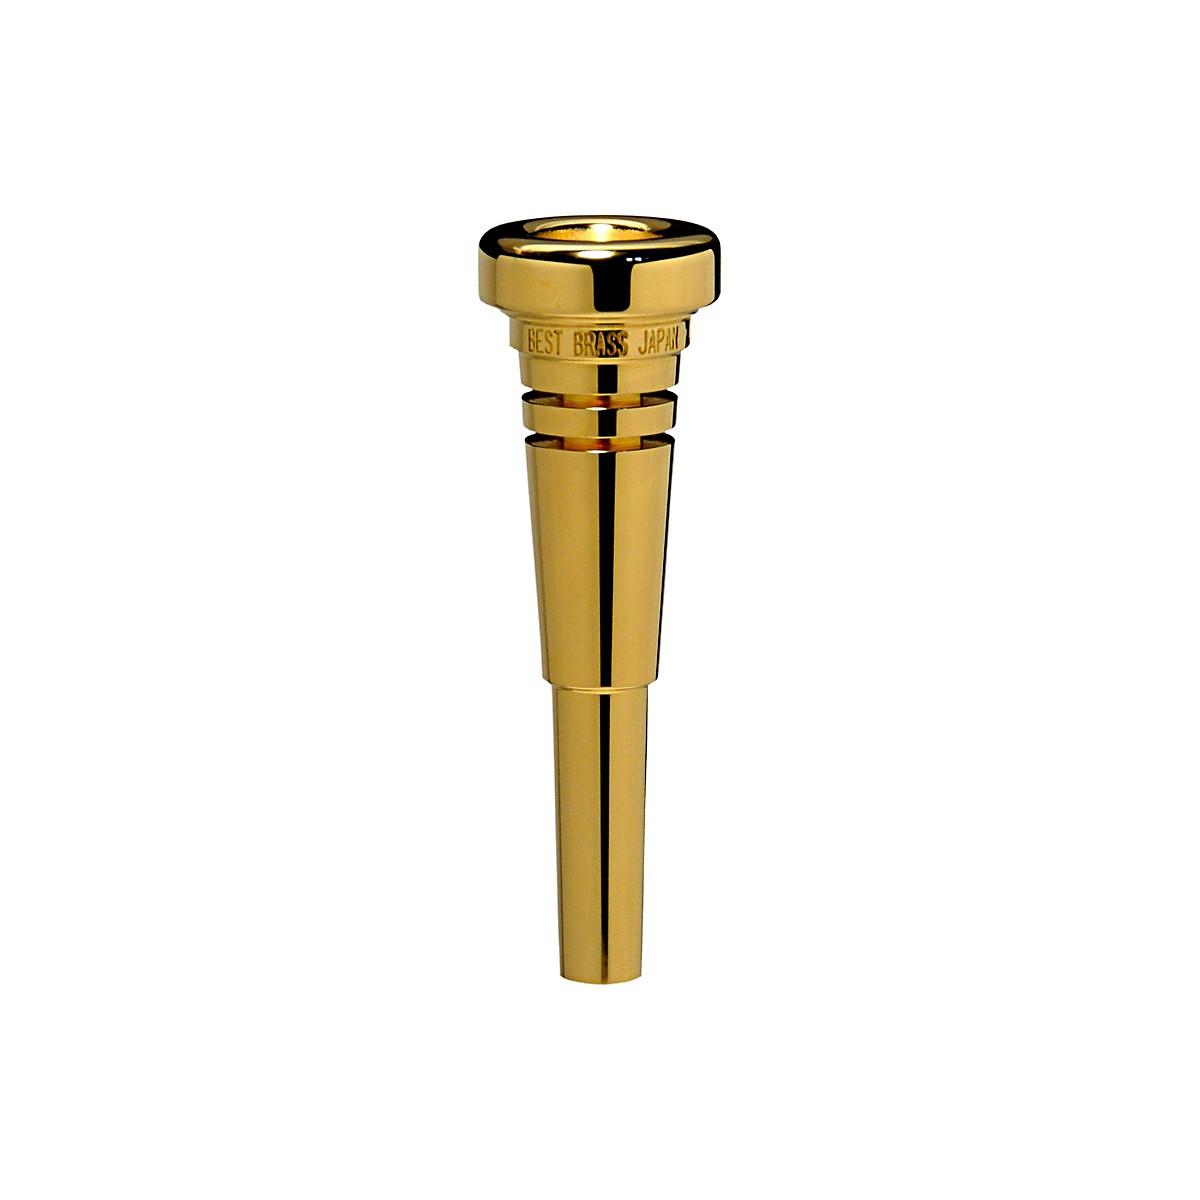 Best Brass TP-1C Groove Series Trumpet Mouthpiece